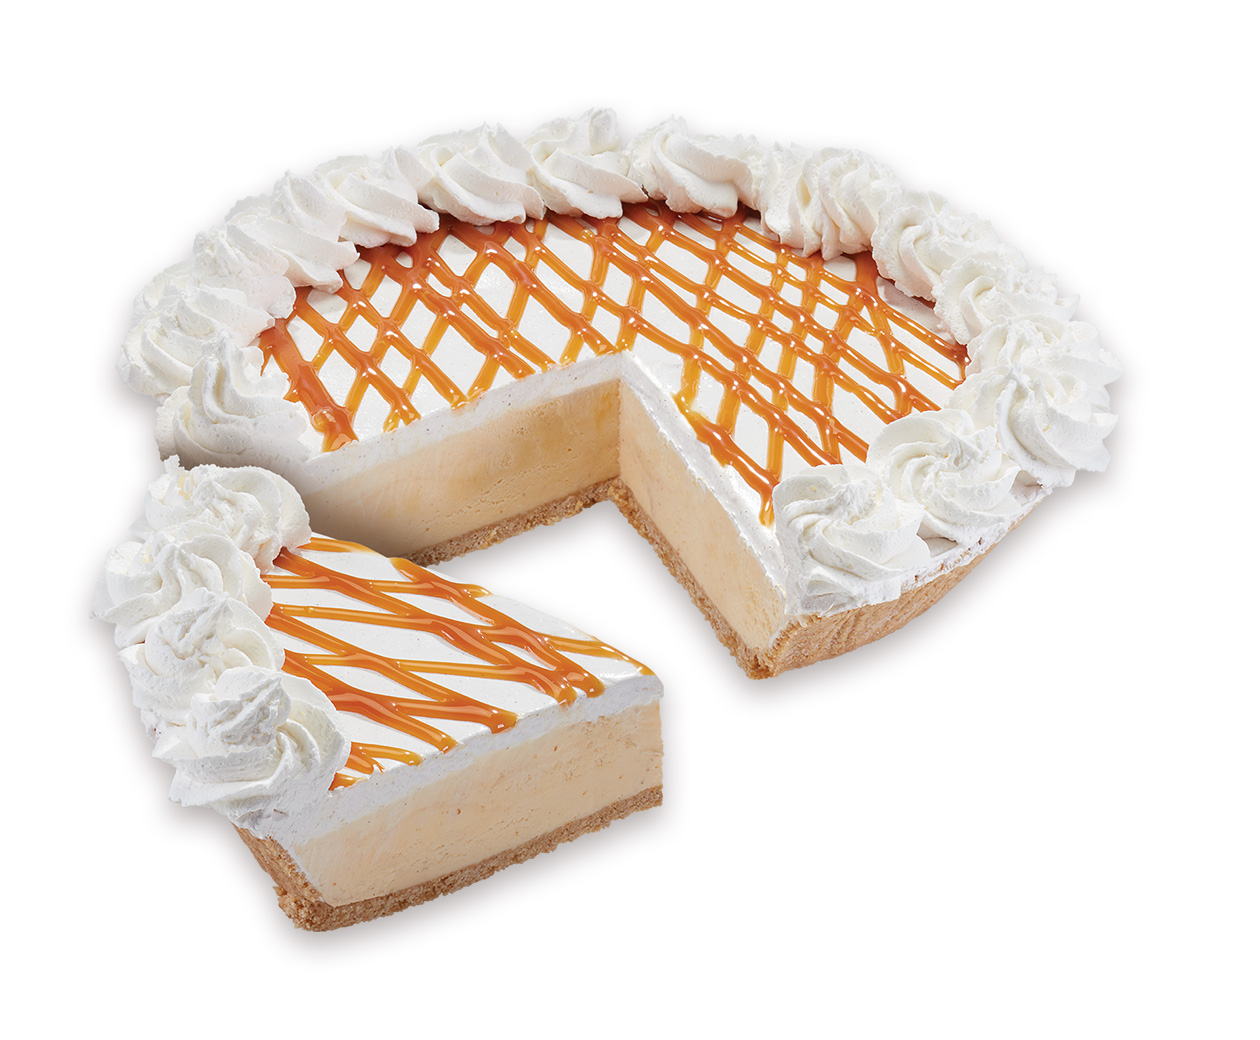 Pumpkin Cheesecake Pie Cold Stone Creamery